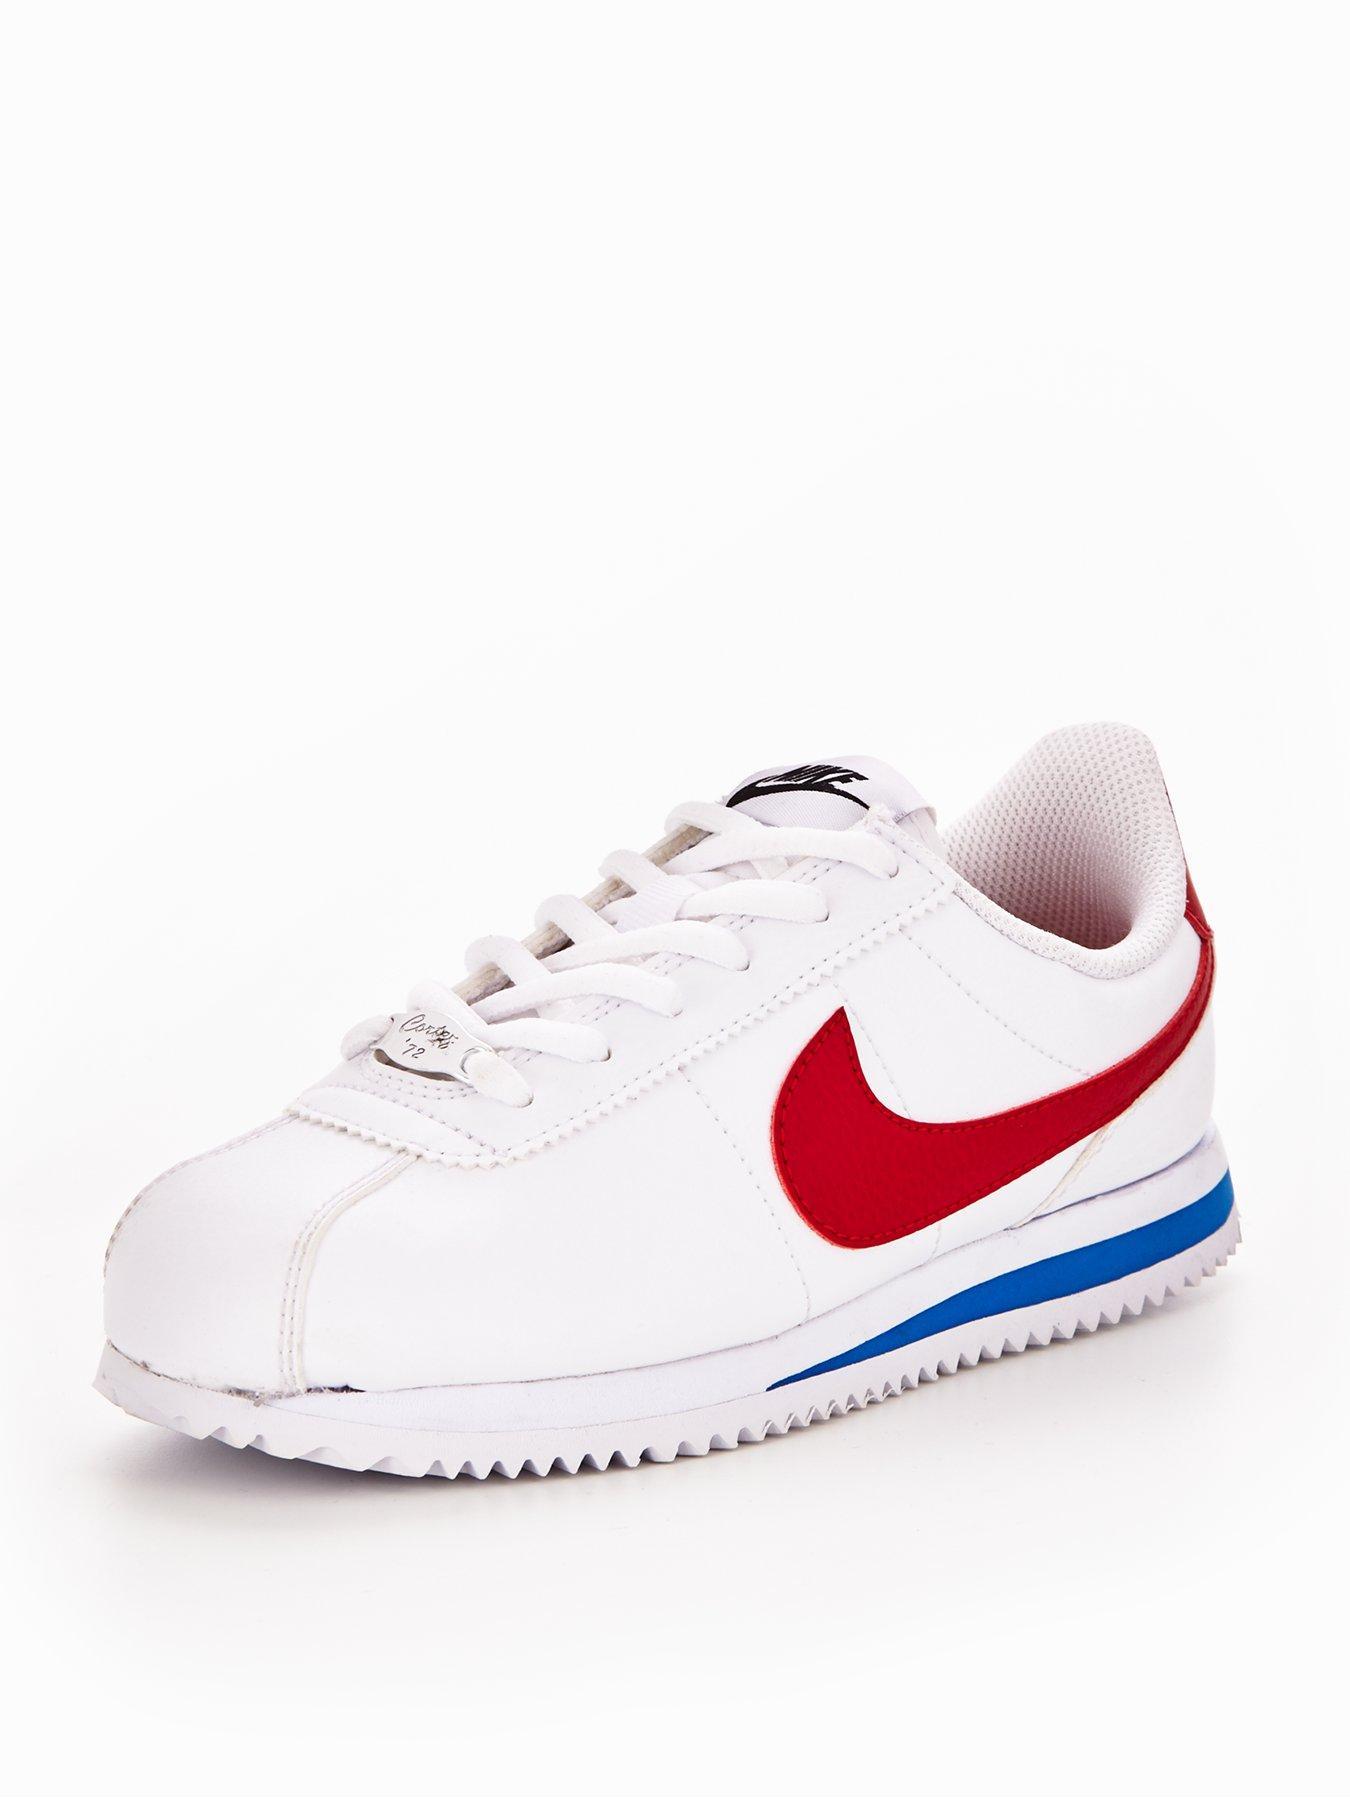 Nike Cortez Kids & baby sports shoes Sports & leisure